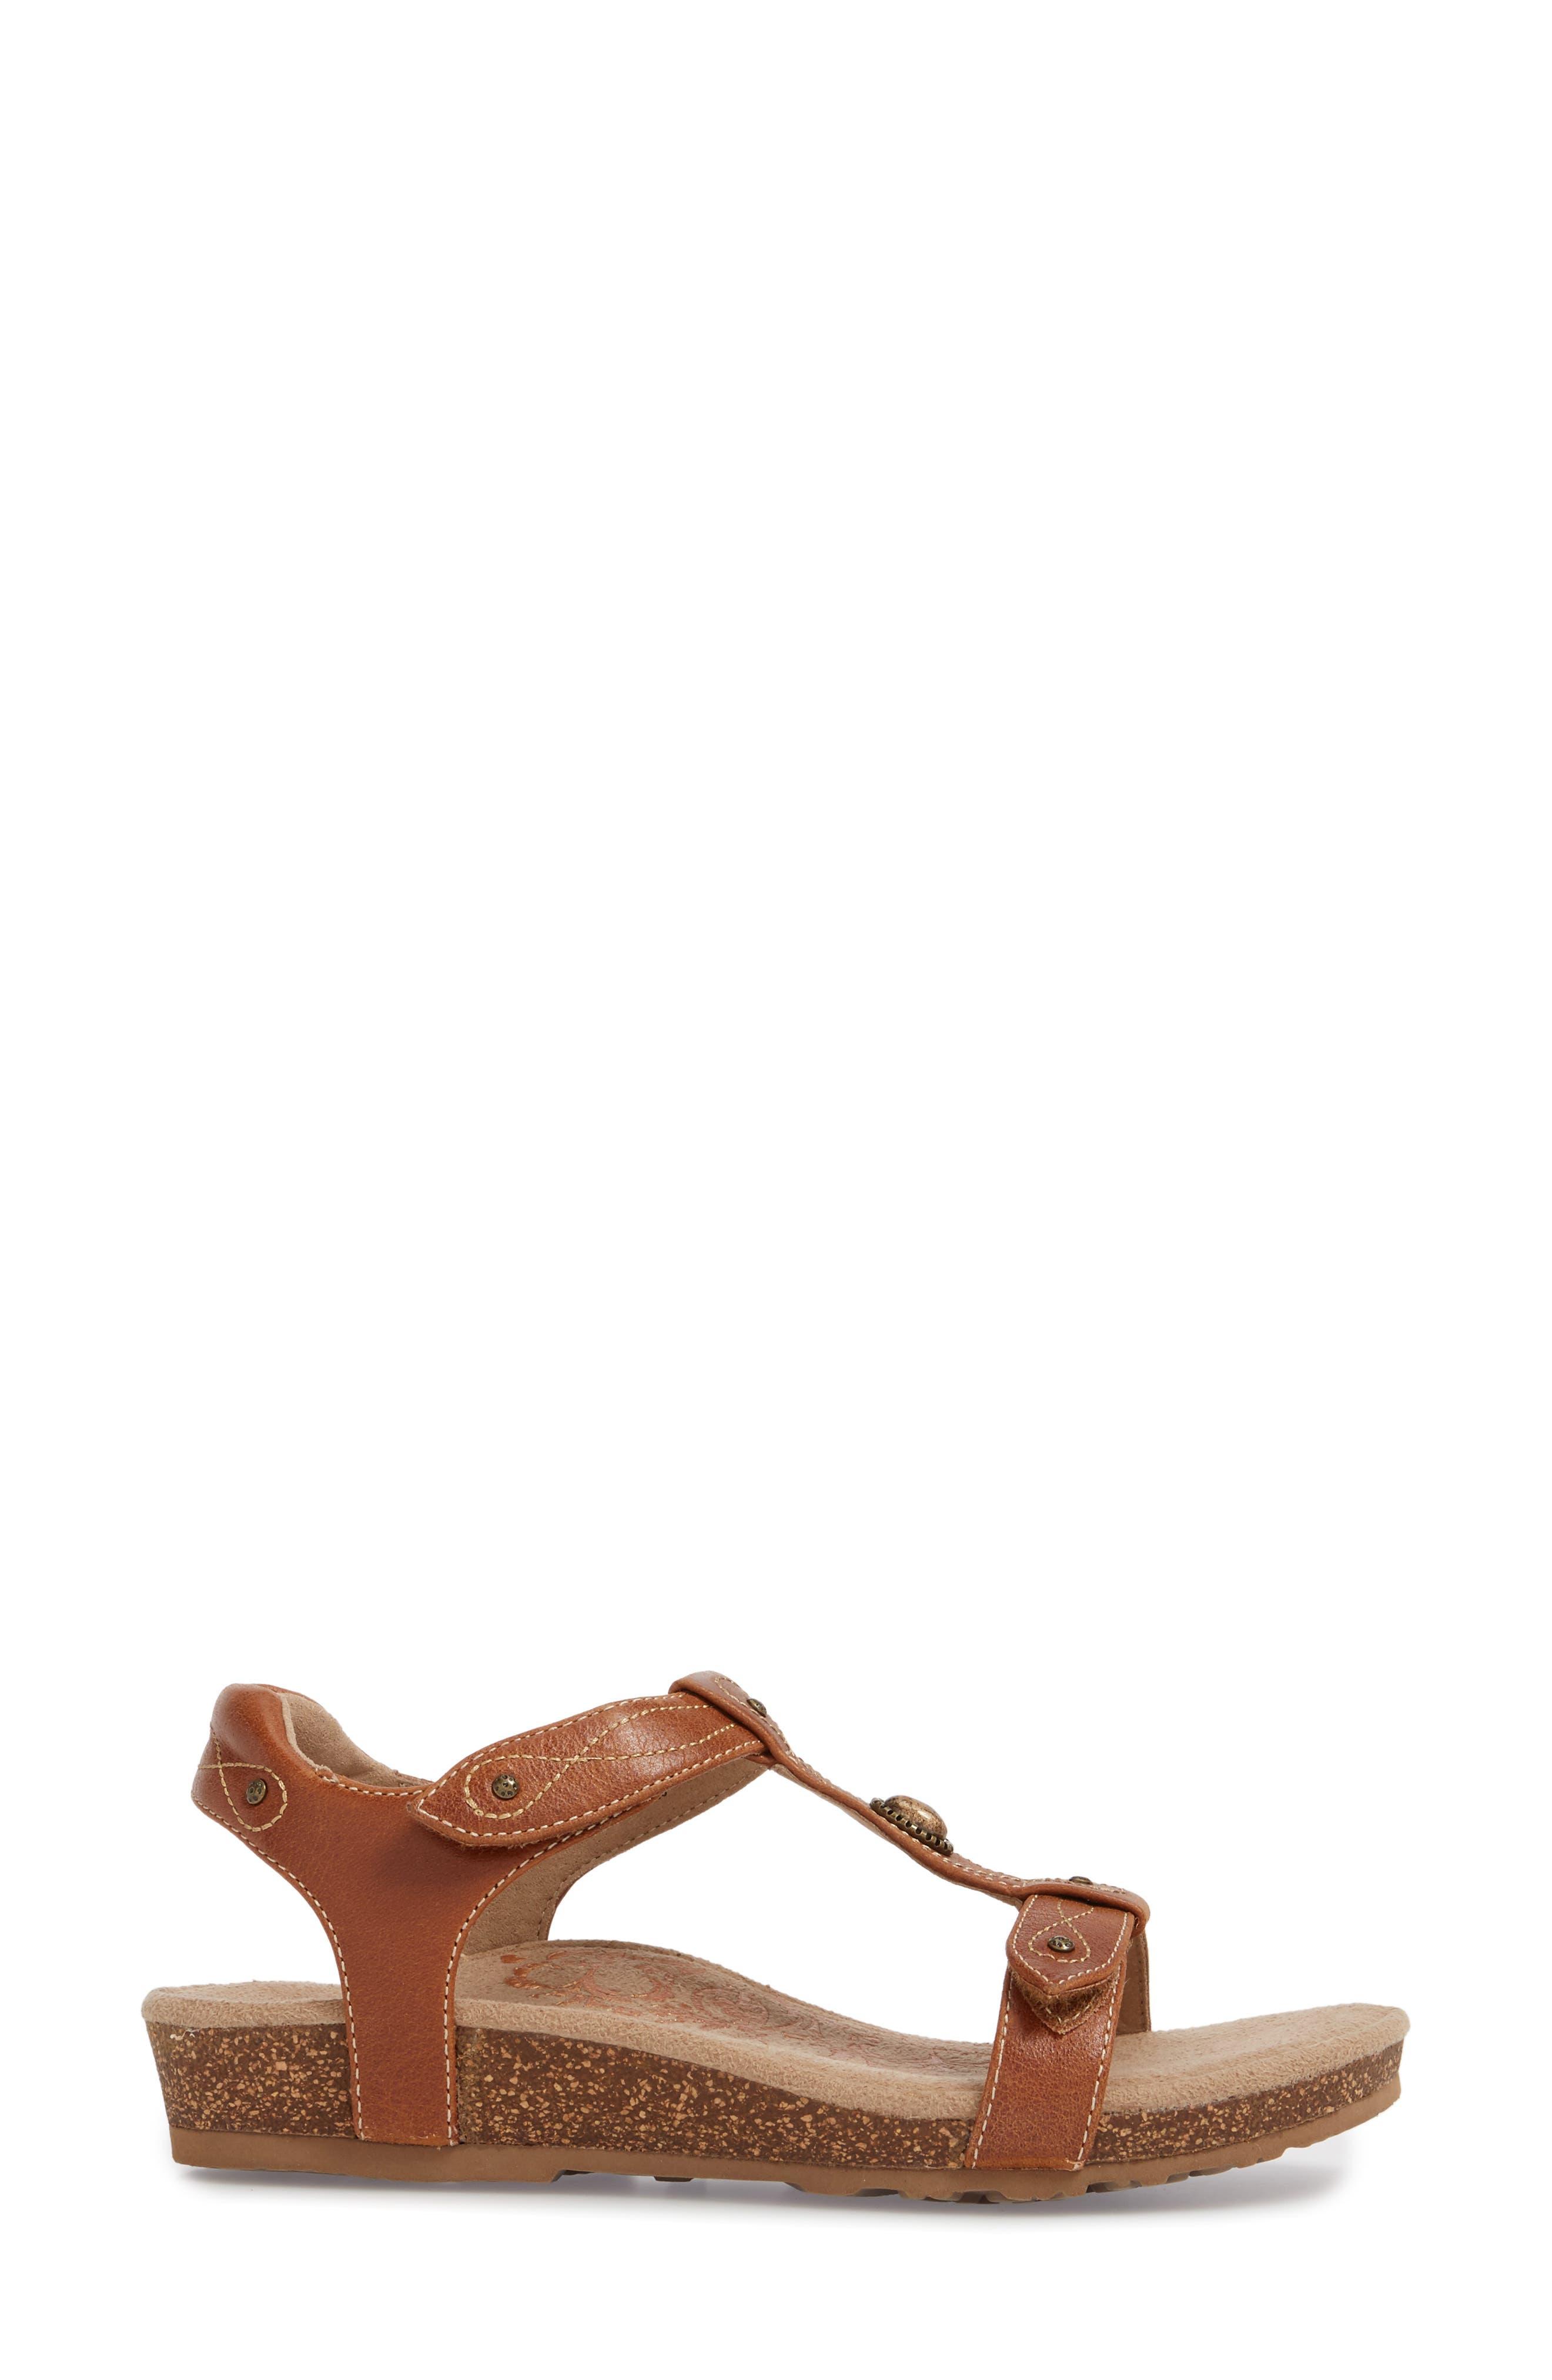 'Lori' Sandal,                             Alternate thumbnail 3, color,                             Cognac Leather